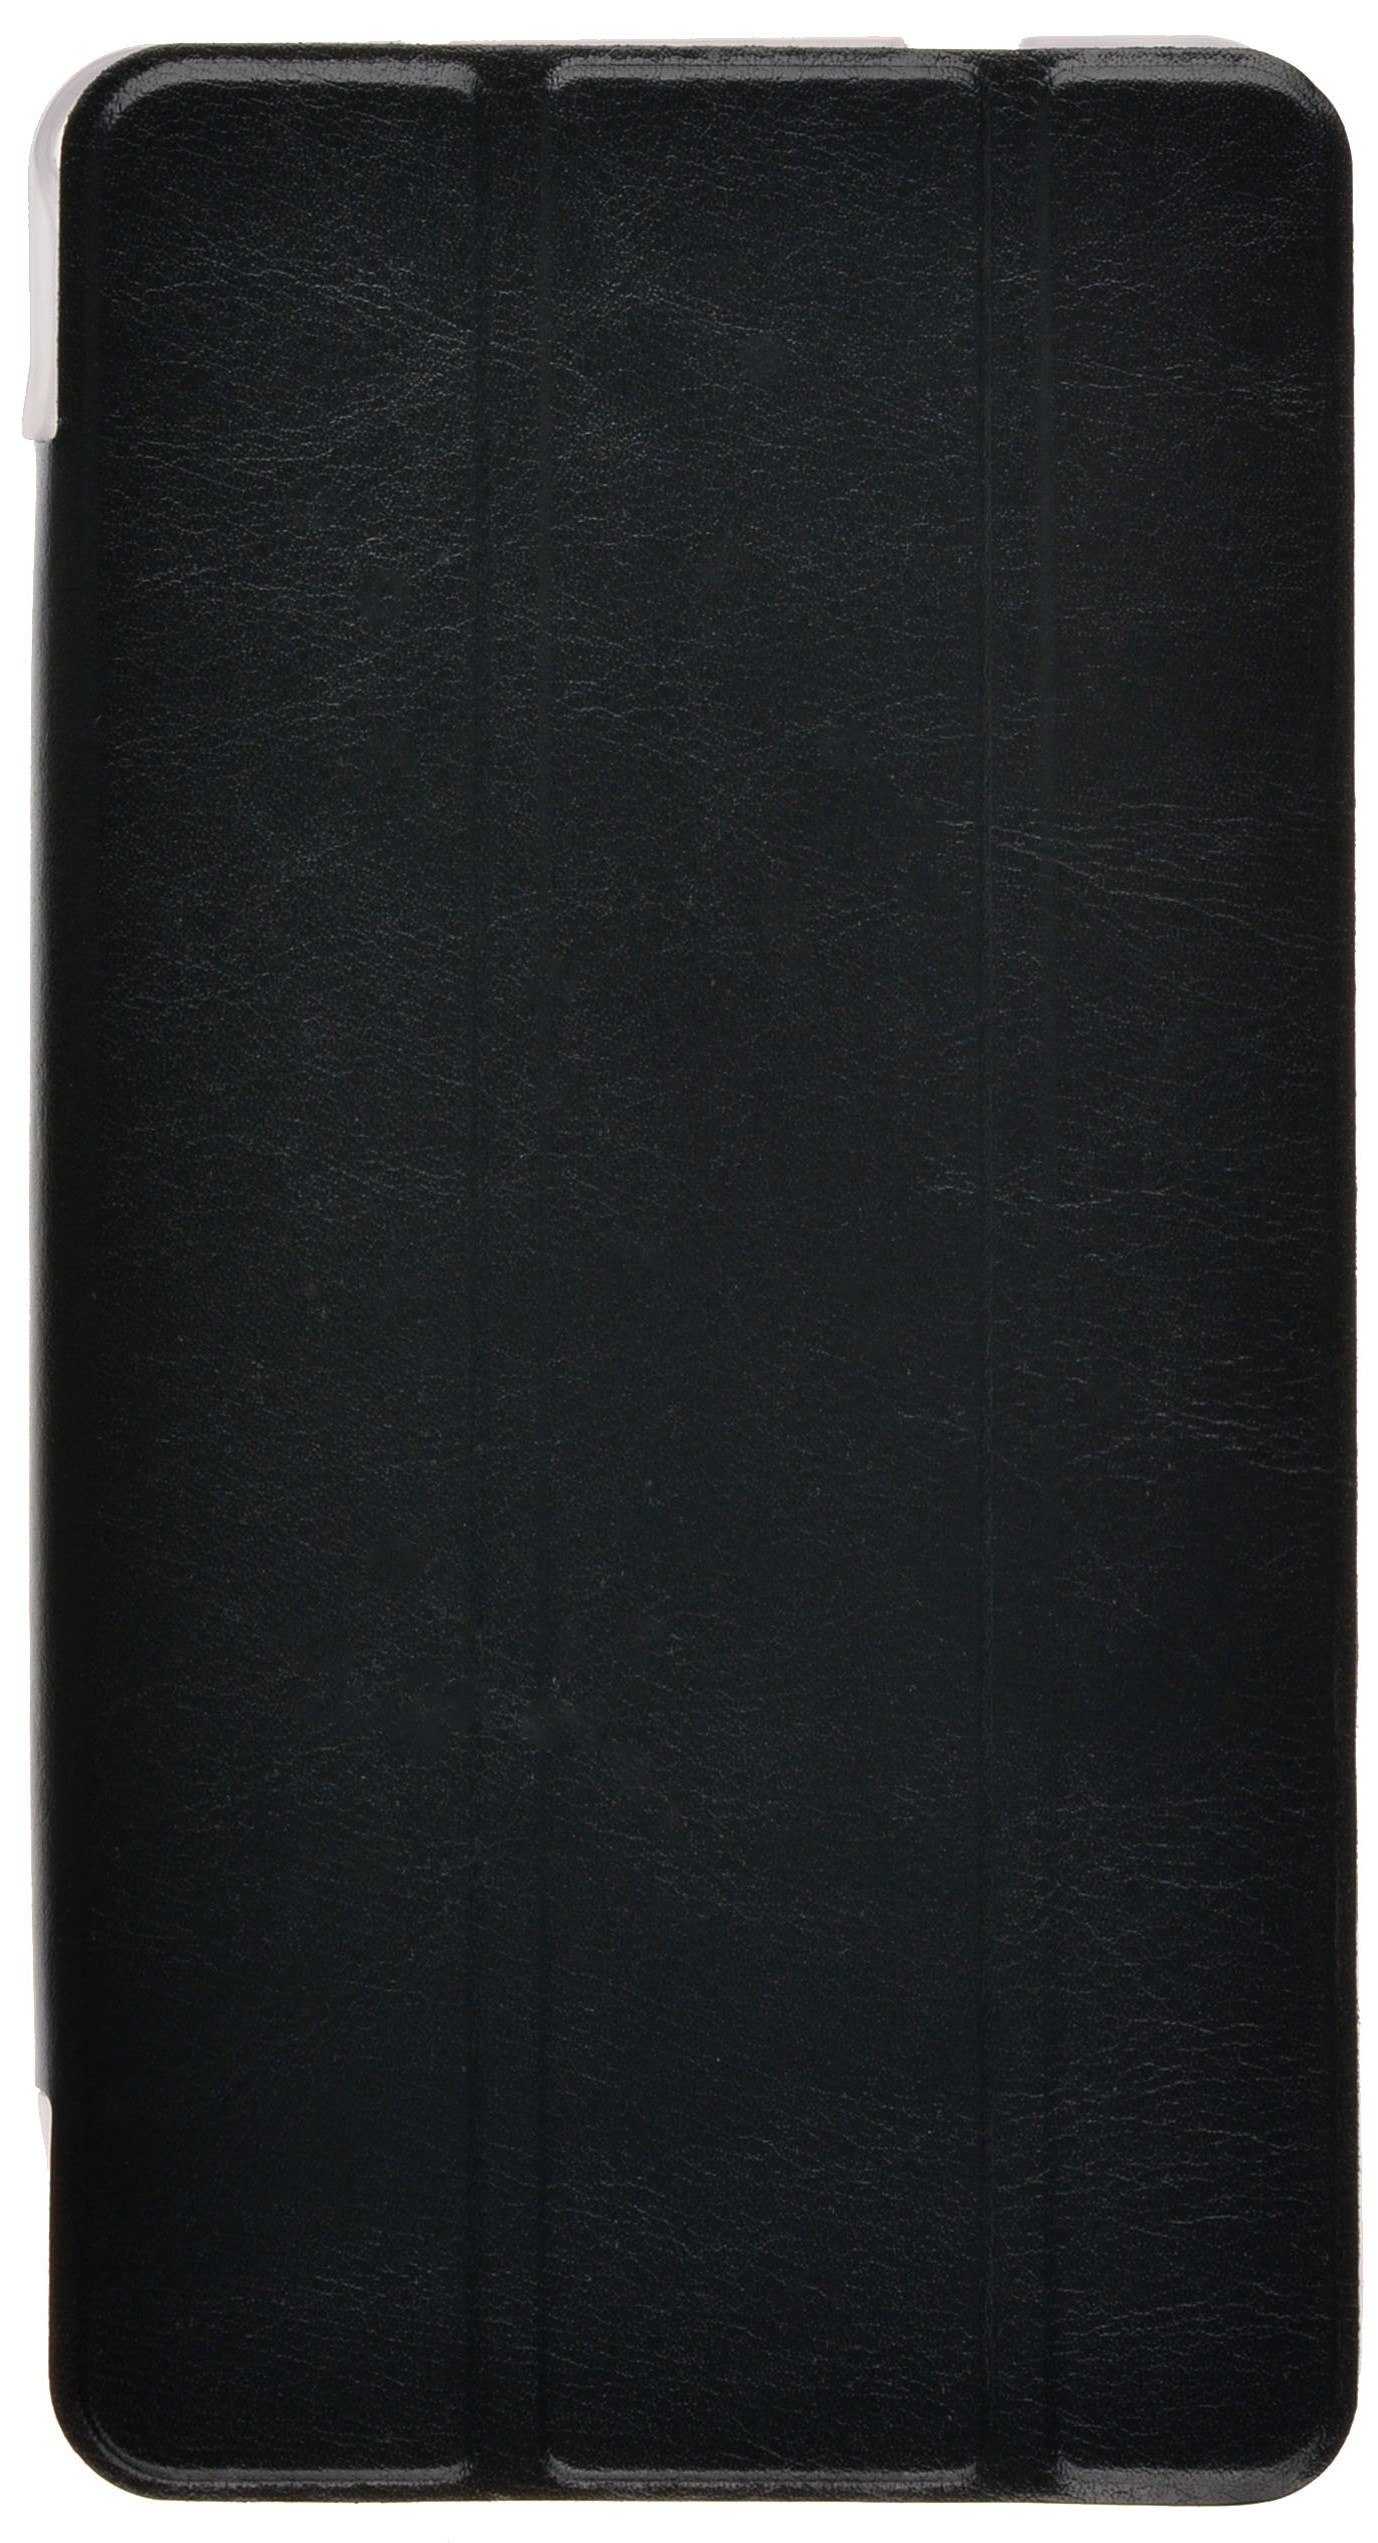 Чехол для планшета ProShield Smart, 4630042525719, черный смартфон lenovo phab plus pb1 770m 32 гб золотистый za070035ru